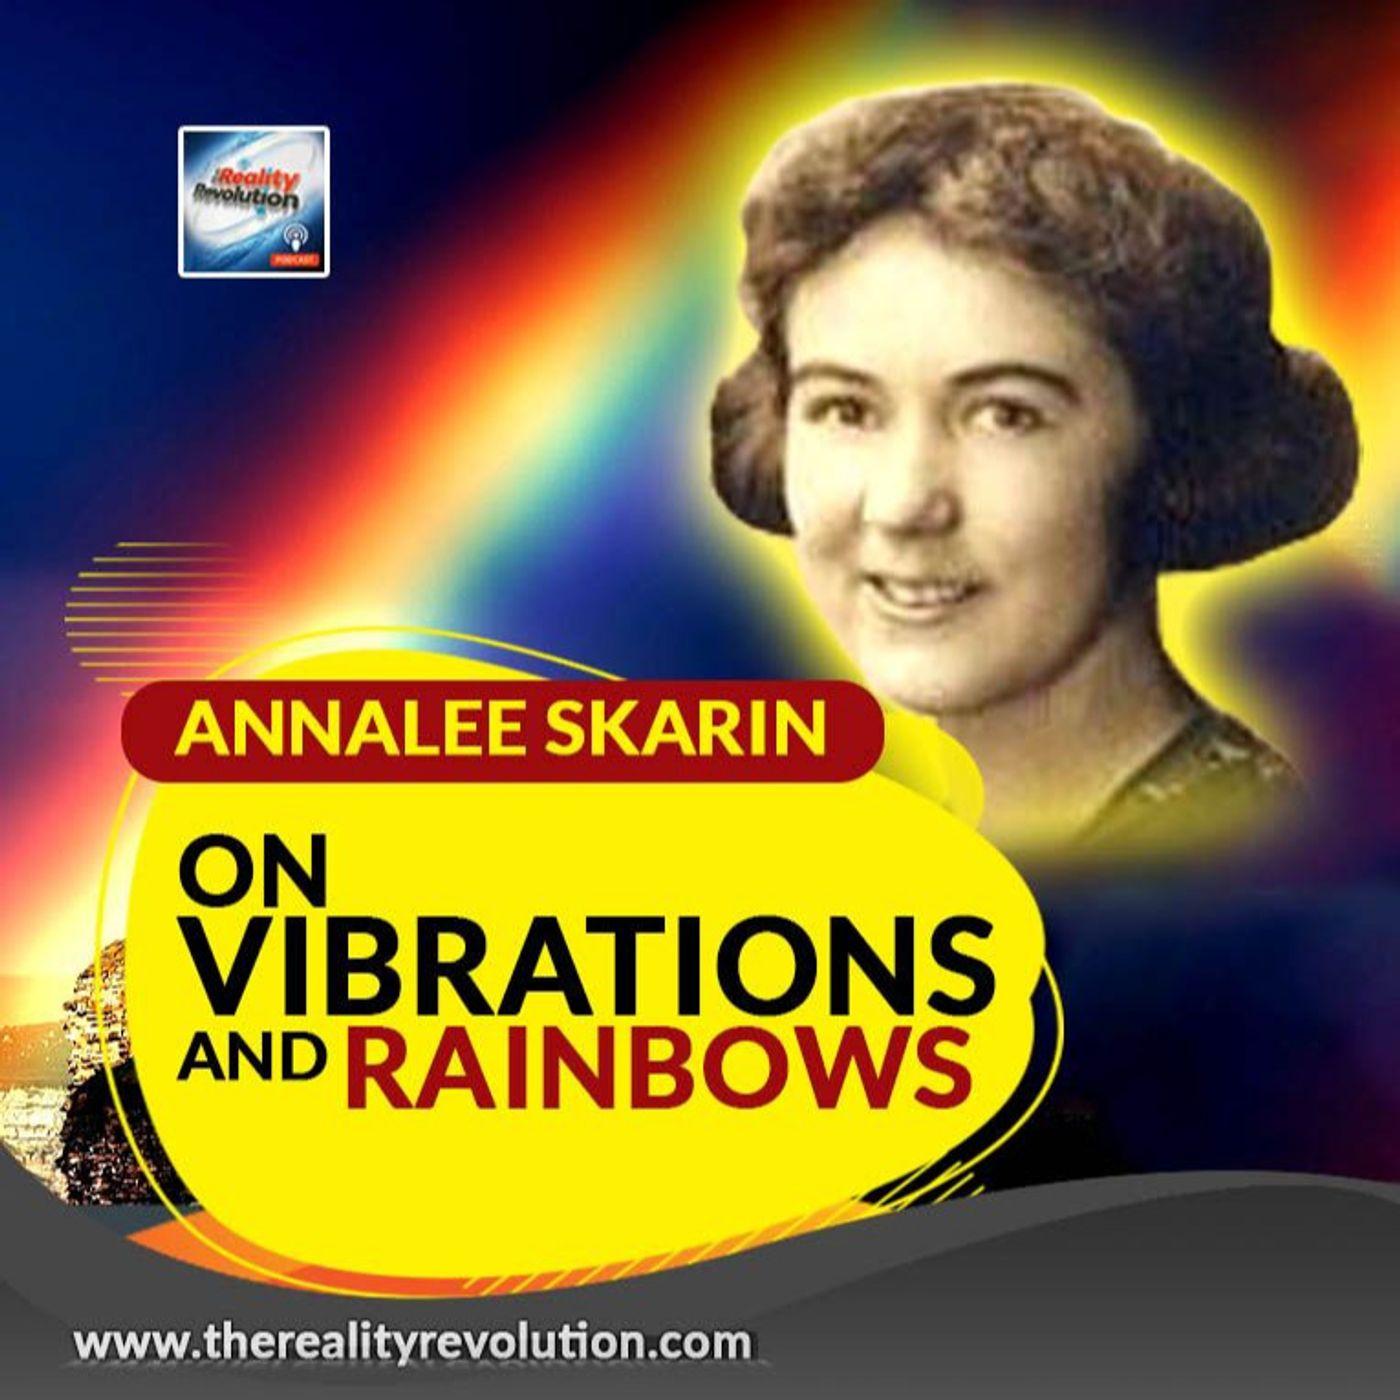 Annalee Skarin - On Vibrations And Rainbows